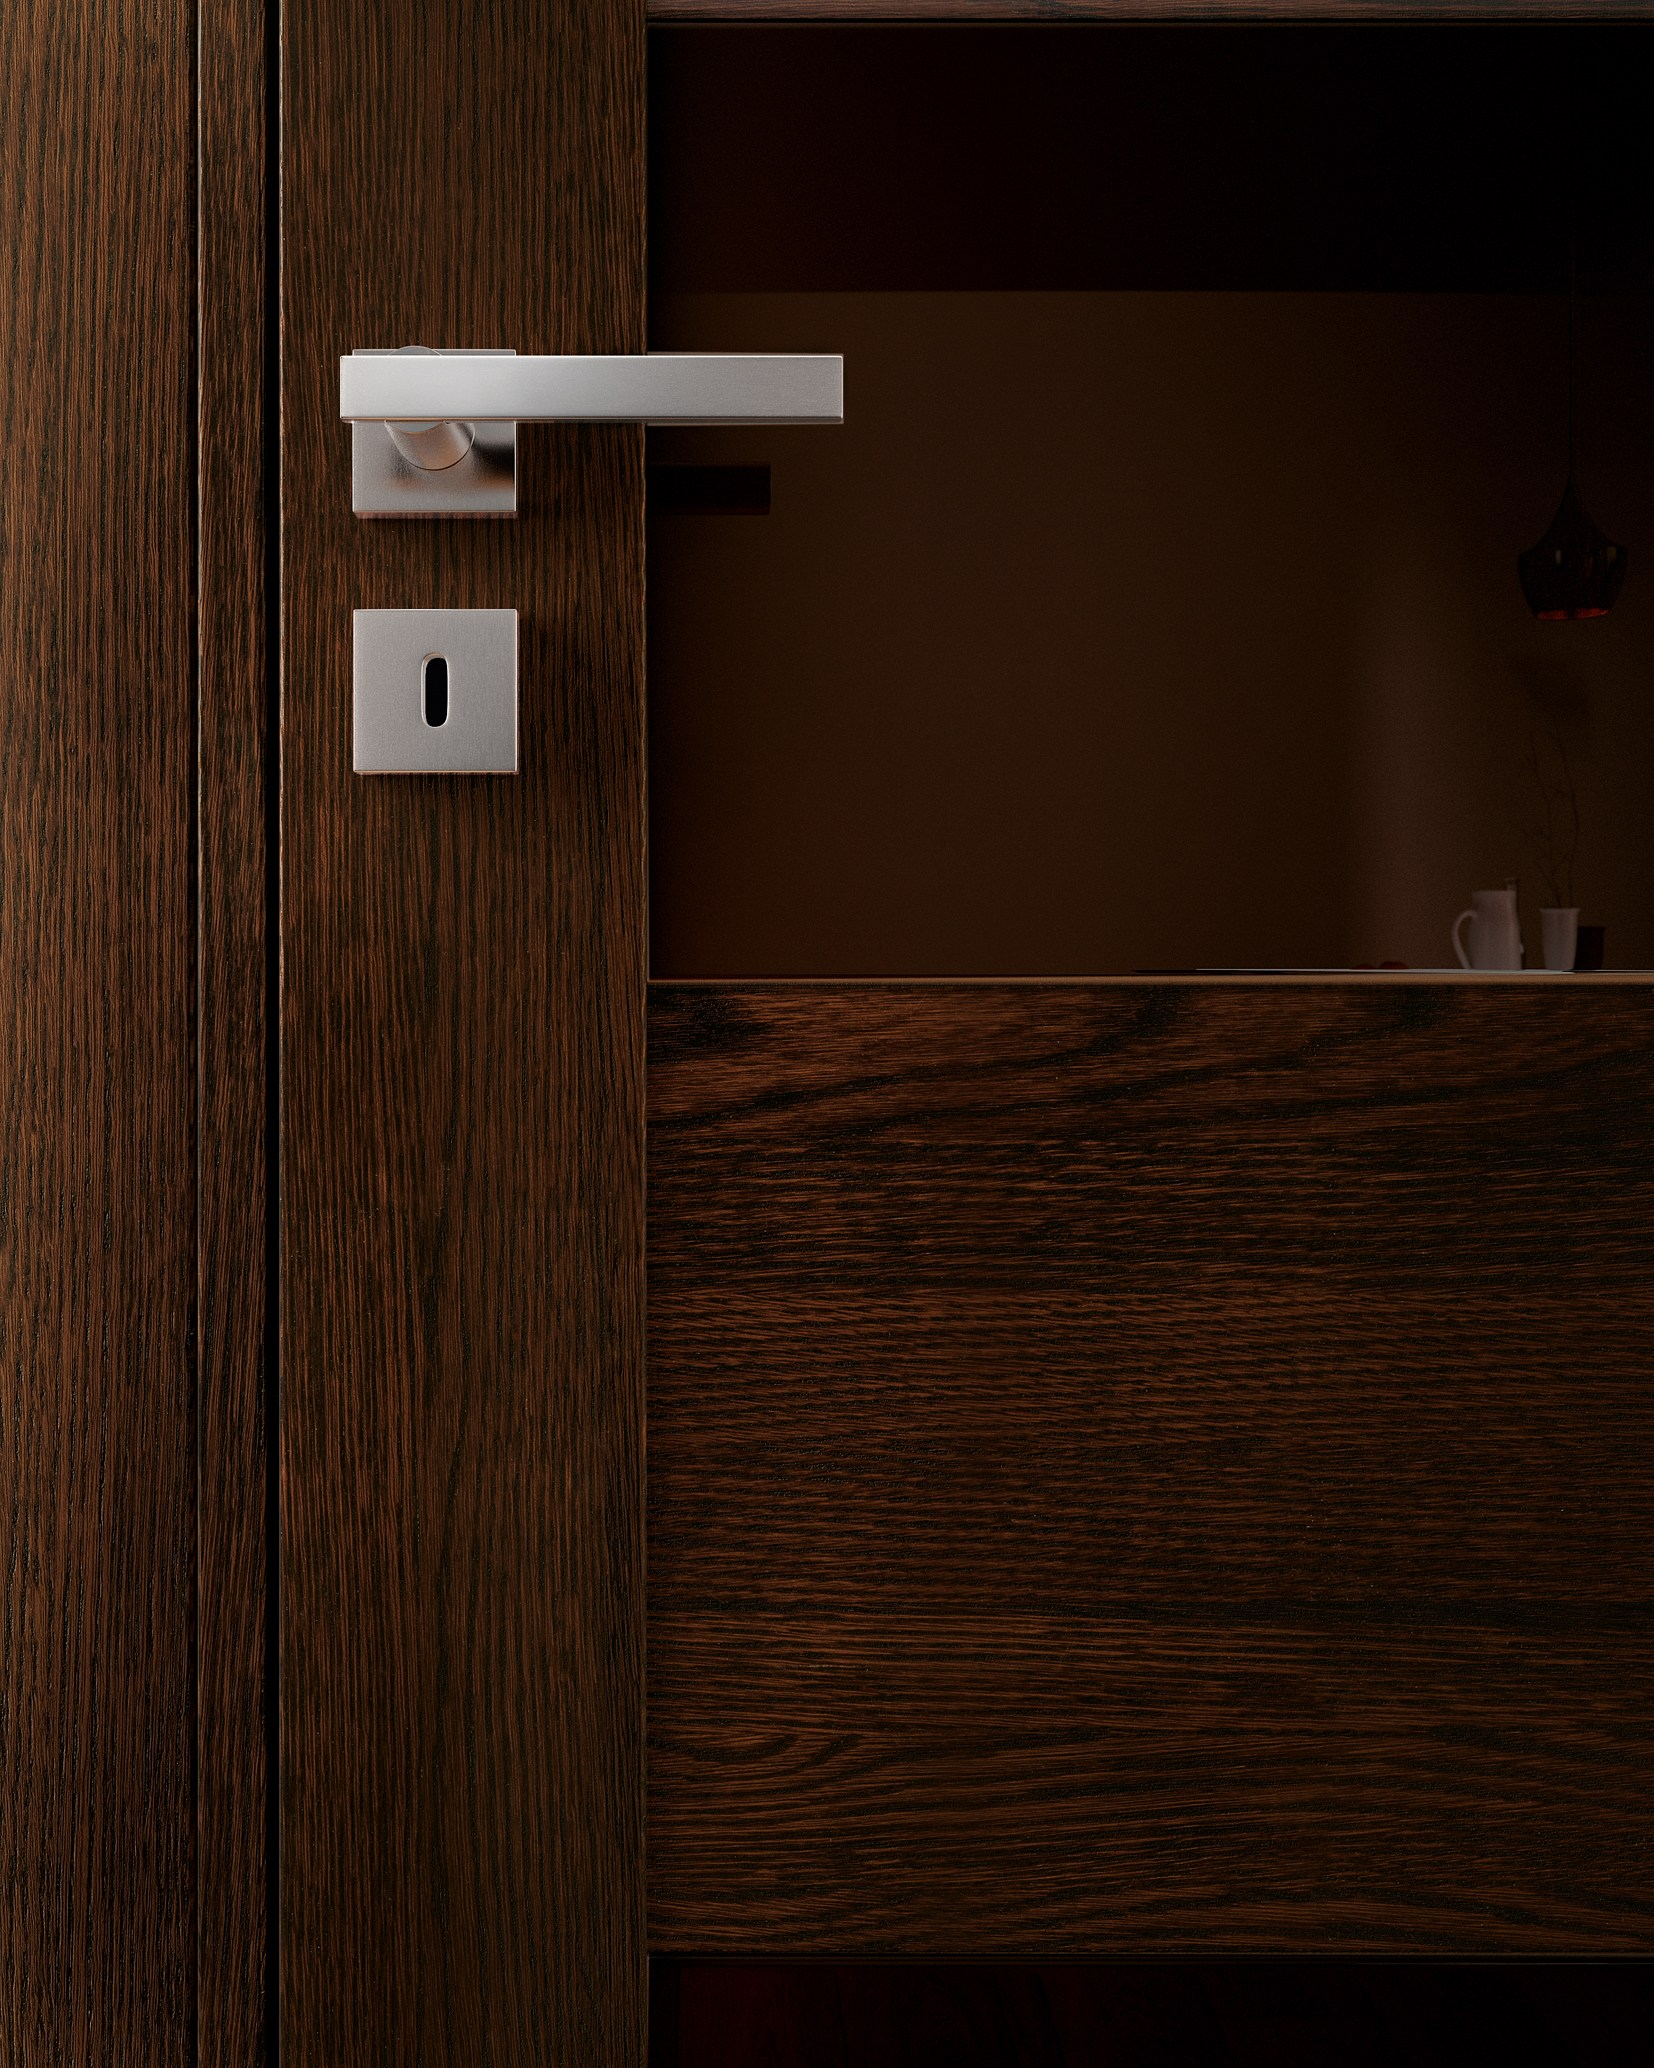 2068 #241208 Hinged Solid Wood Door GABILIA Wenge Door GAROFOLI save image Modern Solid Wood Doors 38671654